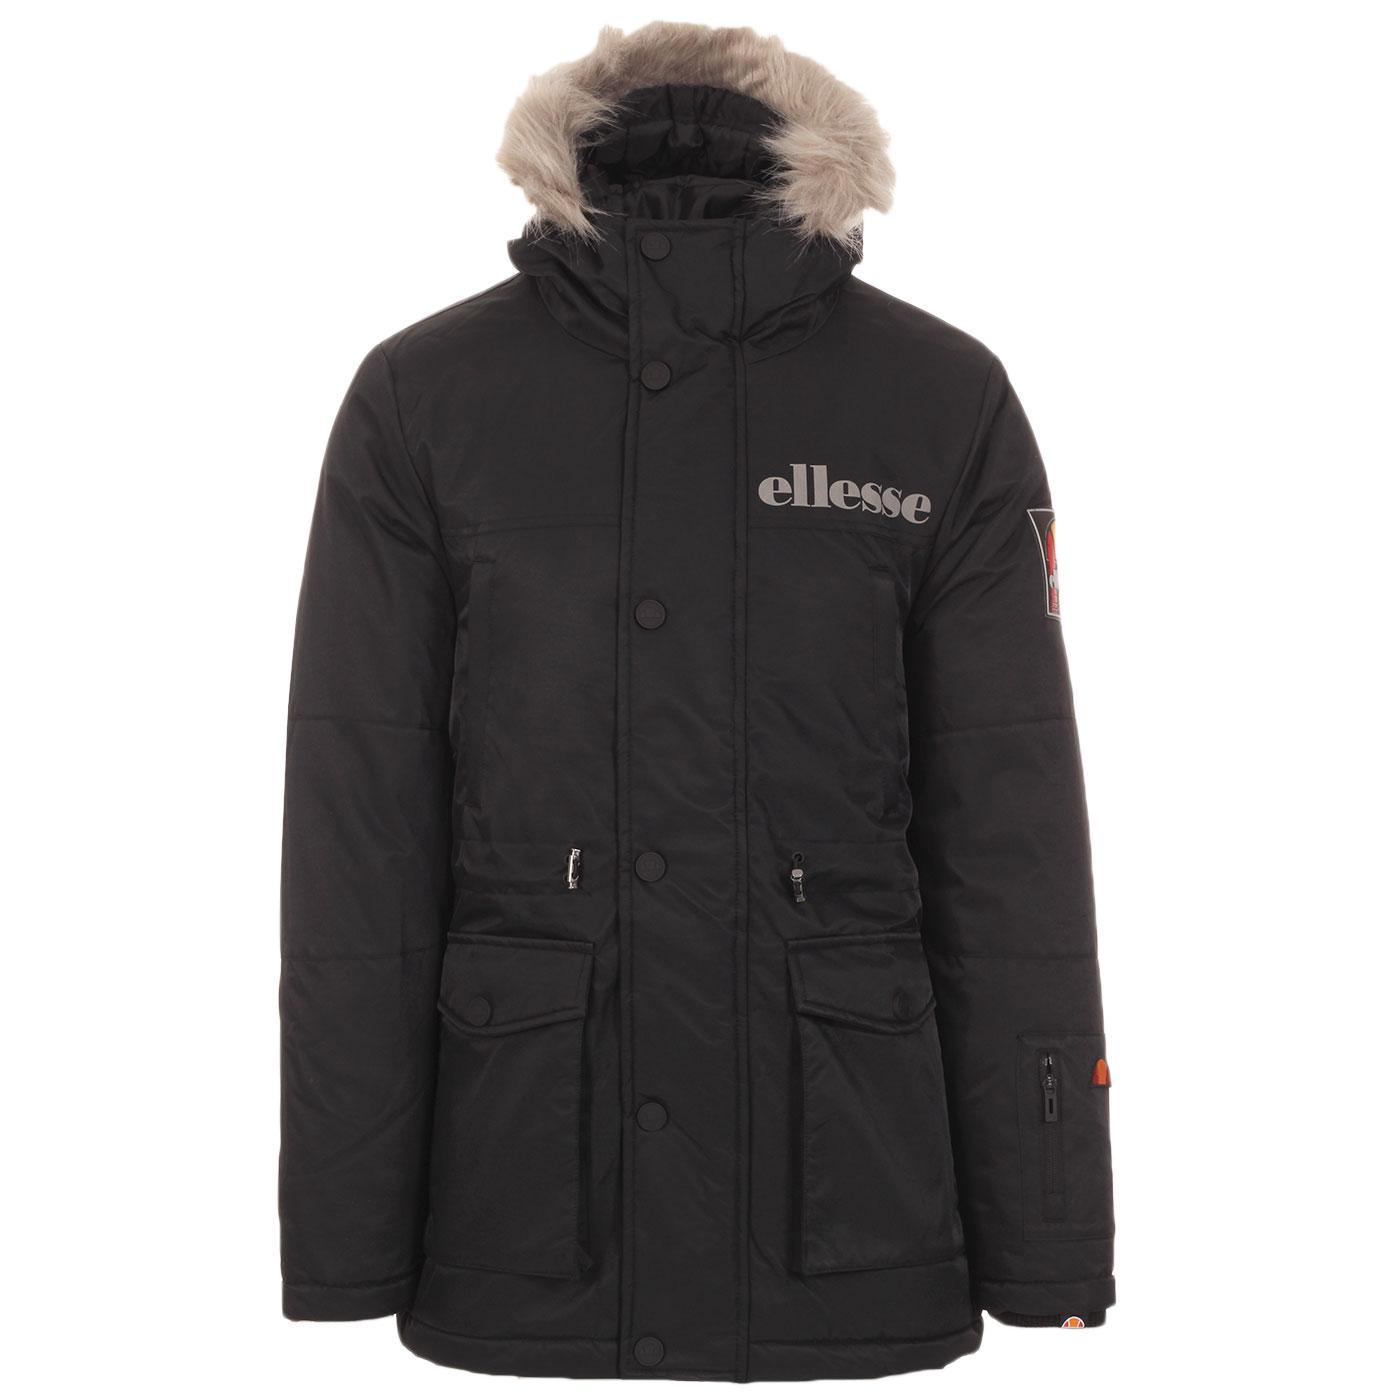 Mazzo ELLESSE Retro 90s Snorkel Parka Jacket (B)